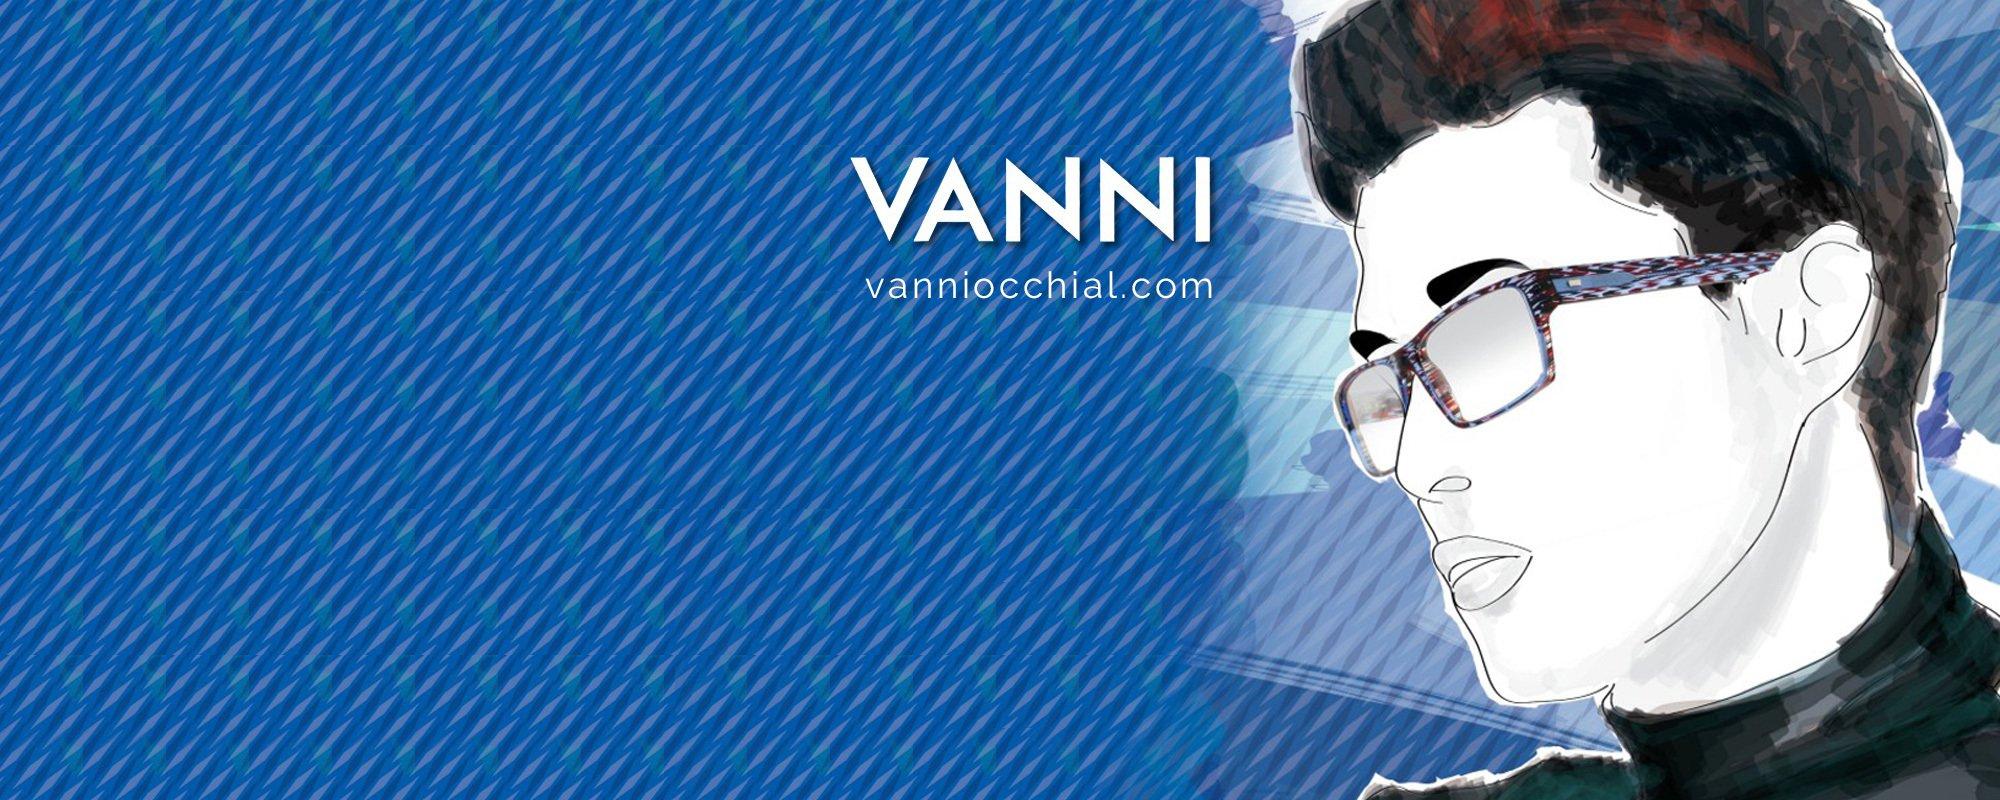 Advertisement of Vanni in Yorkshire, UK